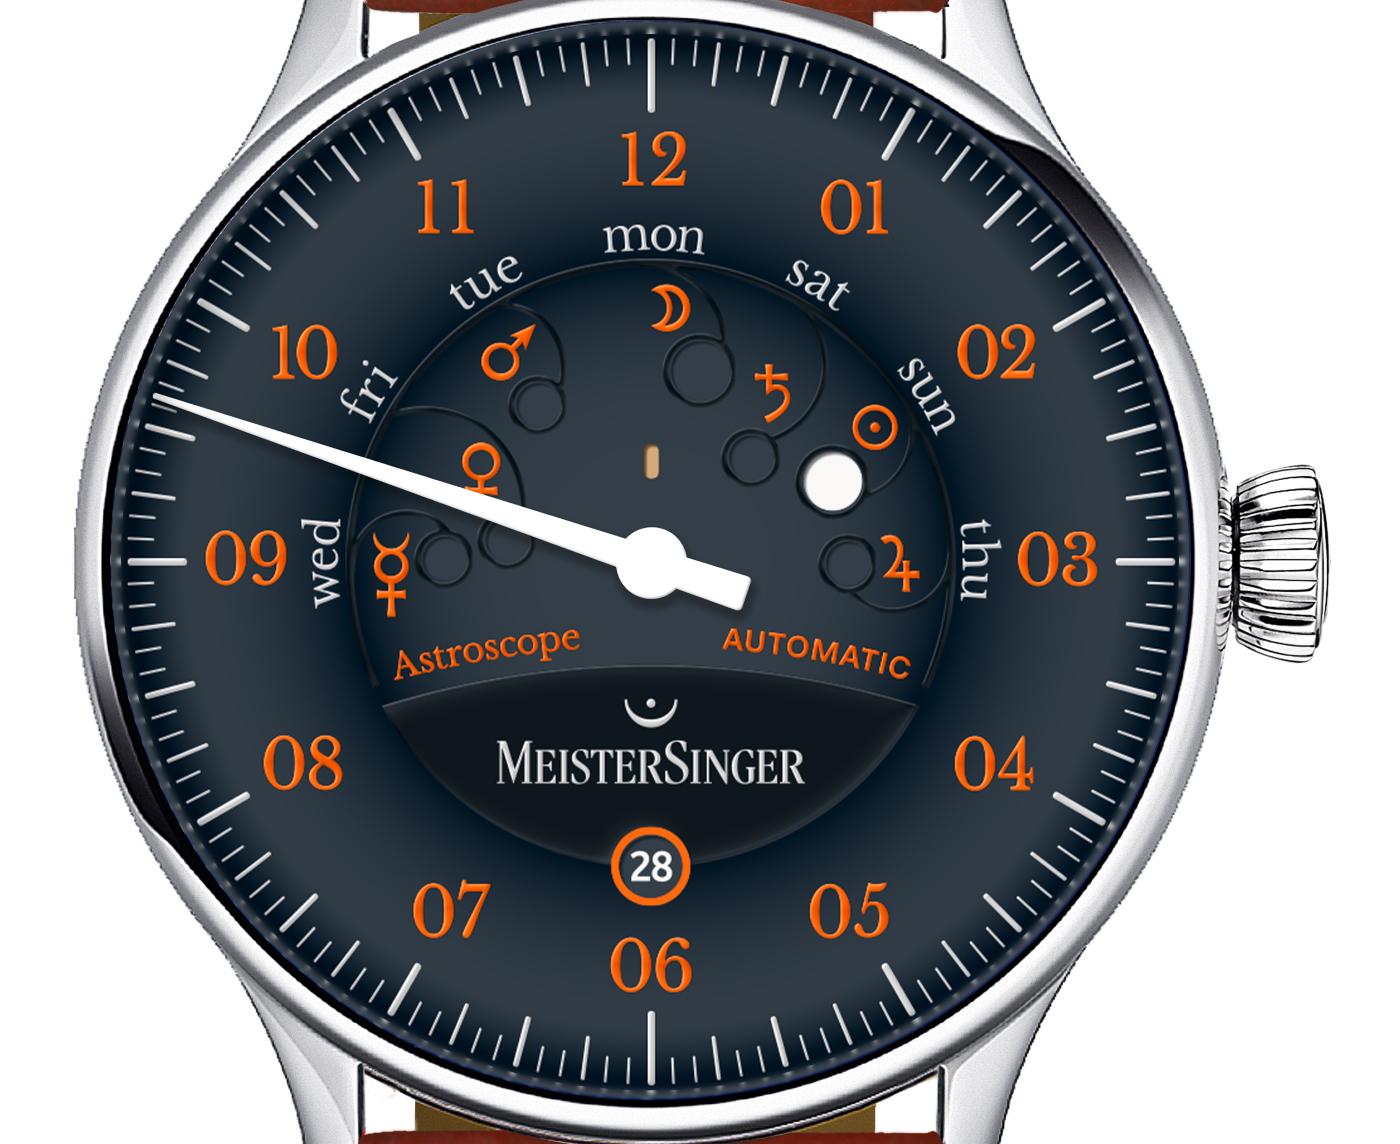 meistersinger_astroscope_close-_europa_star_watch_magazine_2021